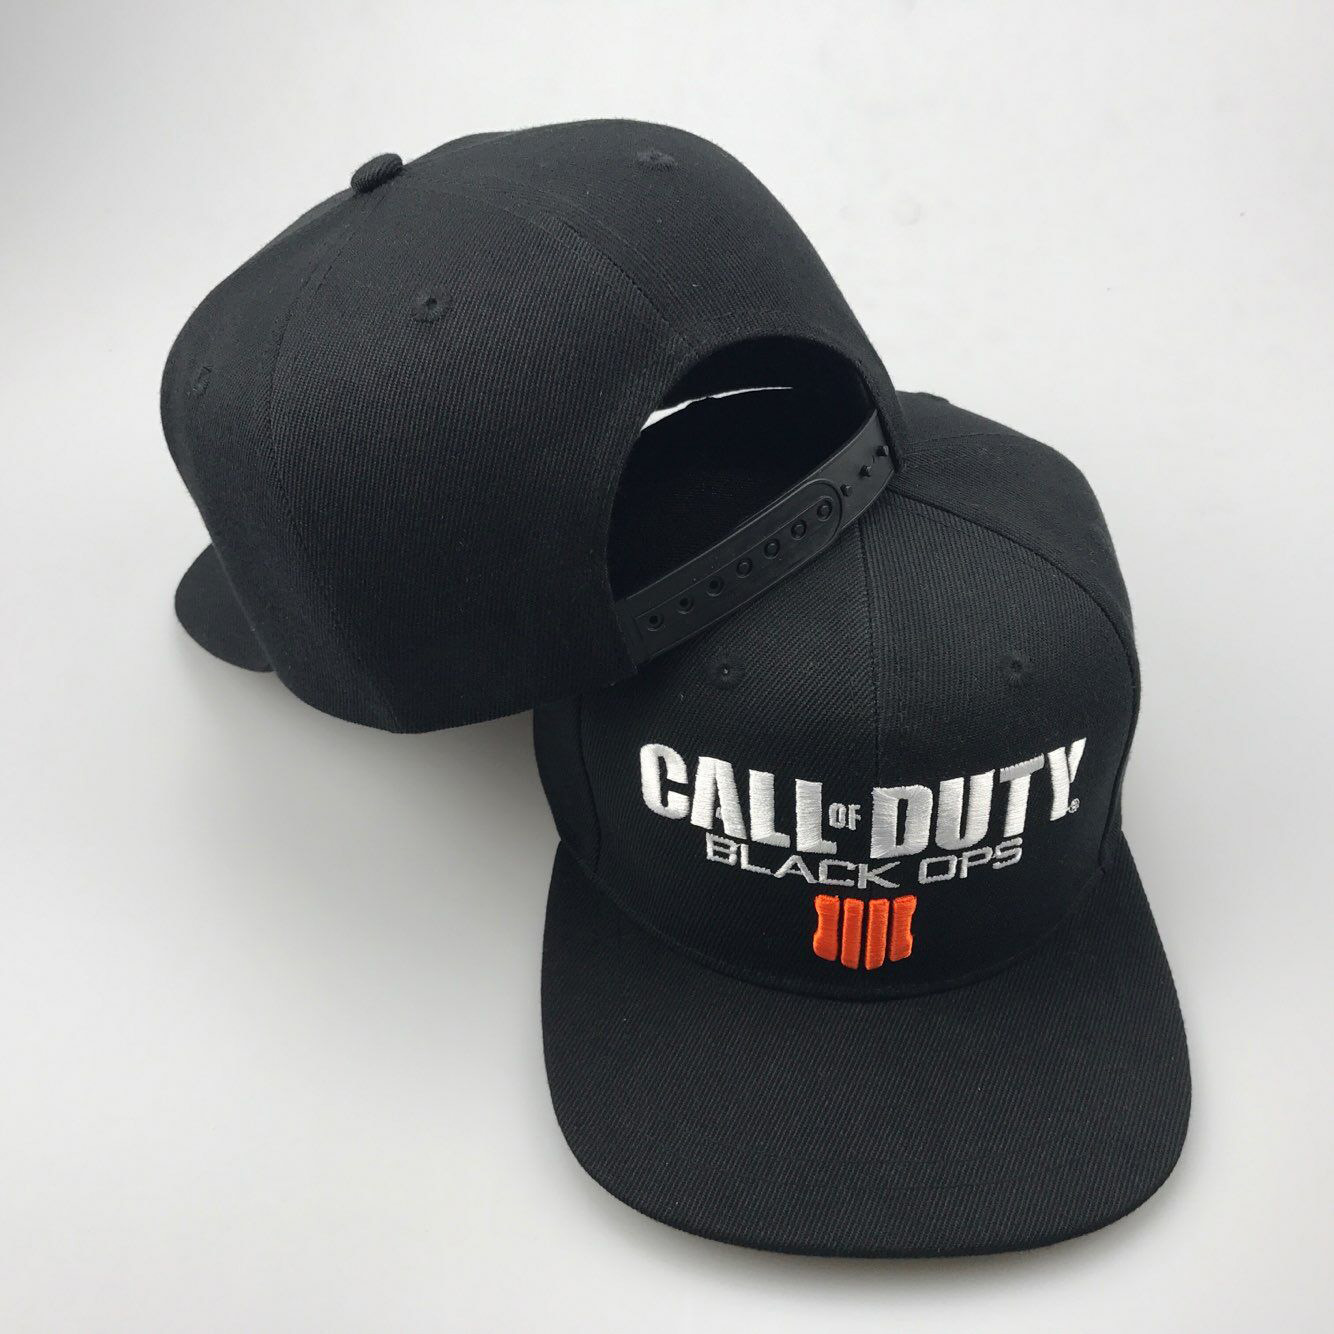 f5a1007ed22 Czapka z Call of Duty  Black Ops 4 gratis jako bonus do gry